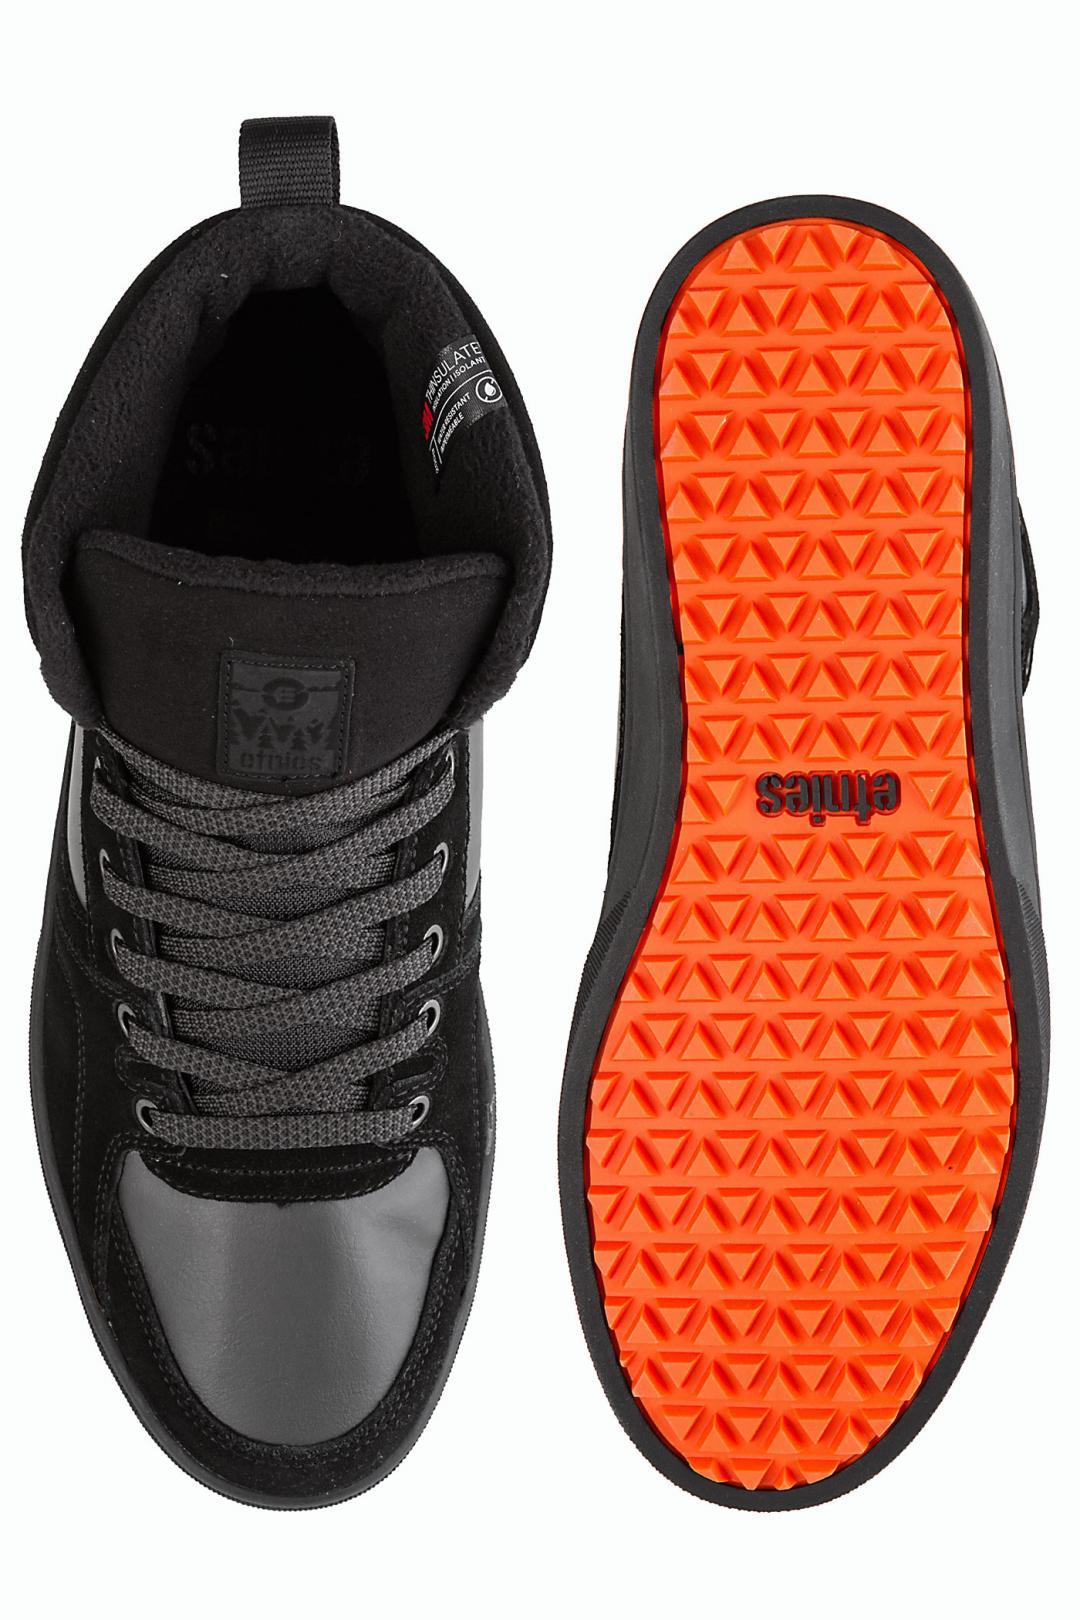 Uomo Etnies Harrison HTW black dark grey gum   Sneakers high top